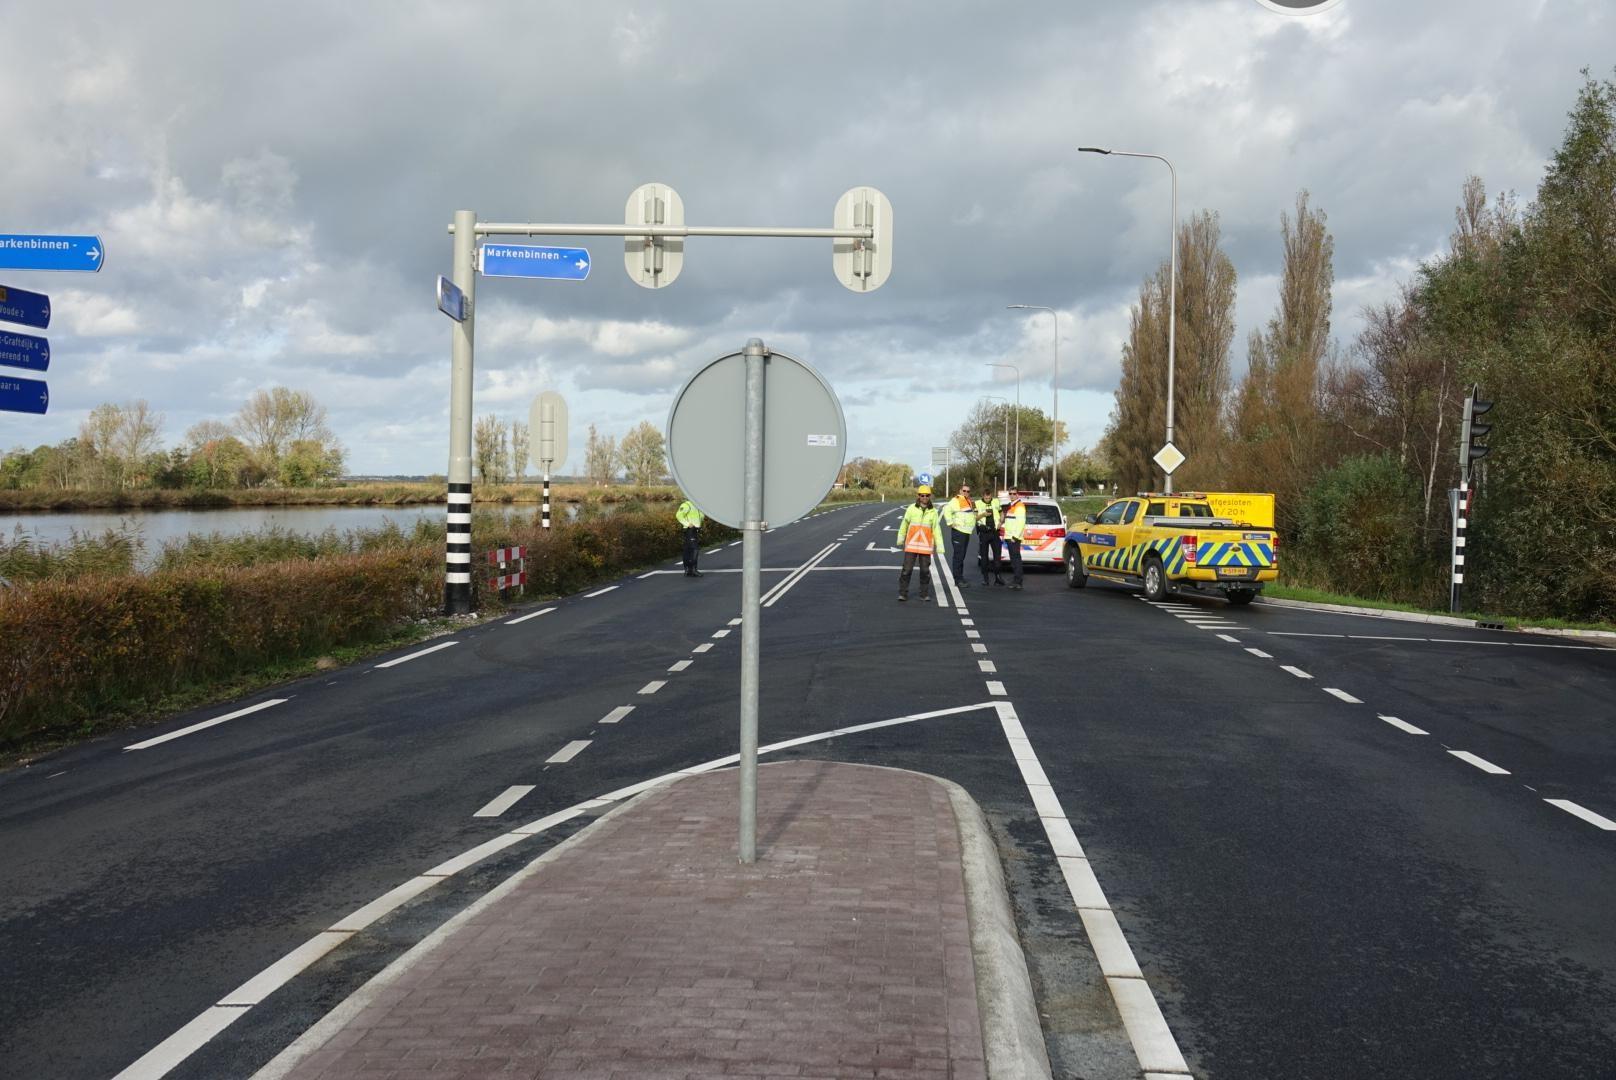 N246 weer open na gaslek in De Woude - Noordhollands Dagblad